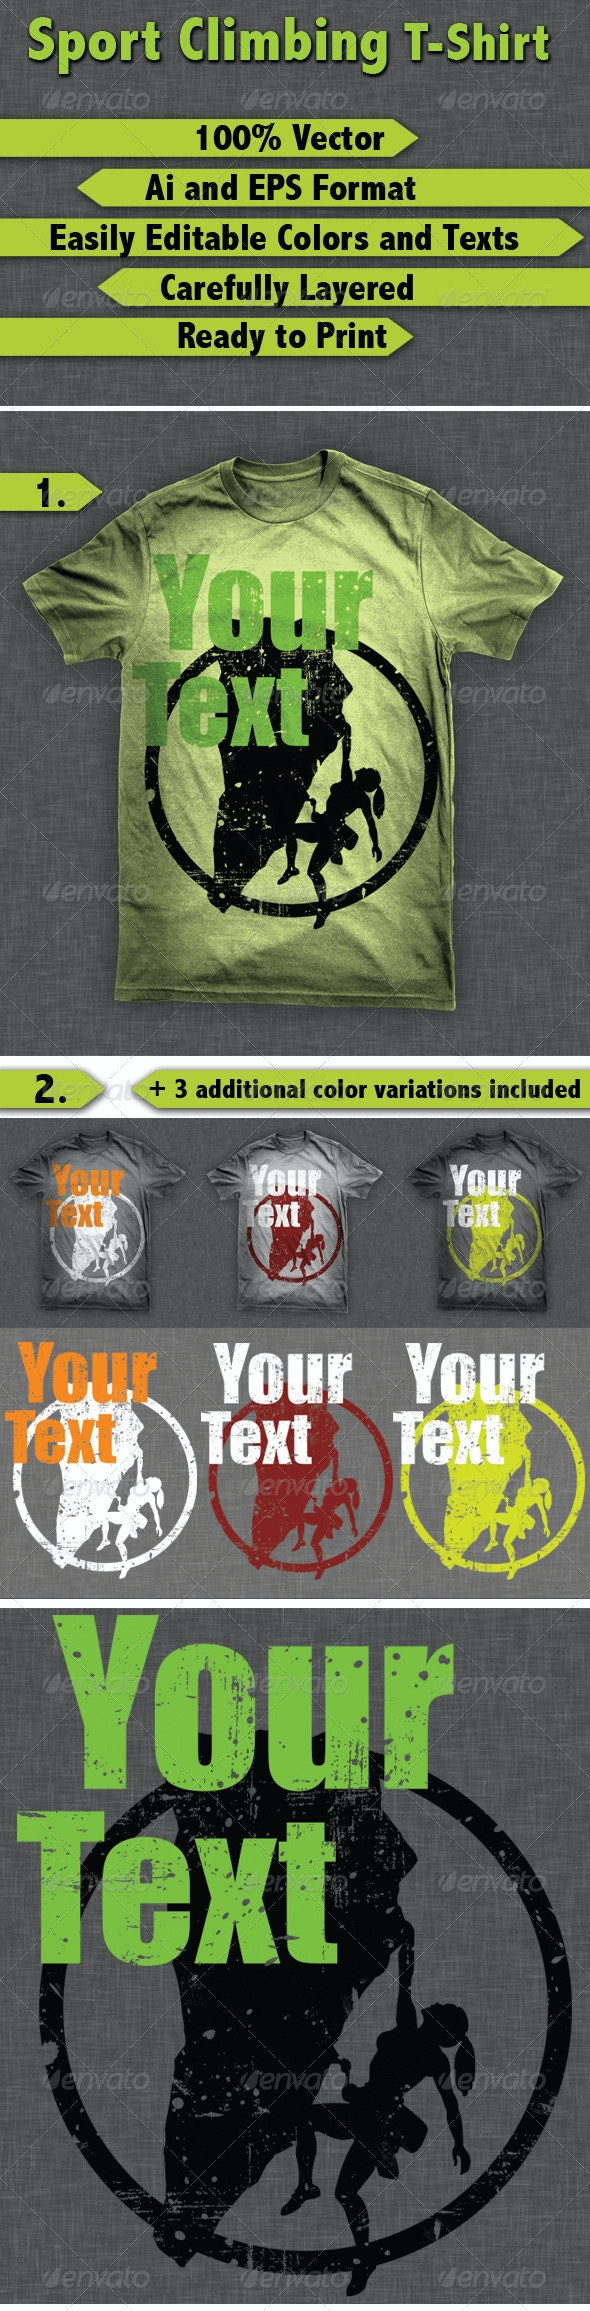 Sport Climbing T-Shirt - T-Shirts